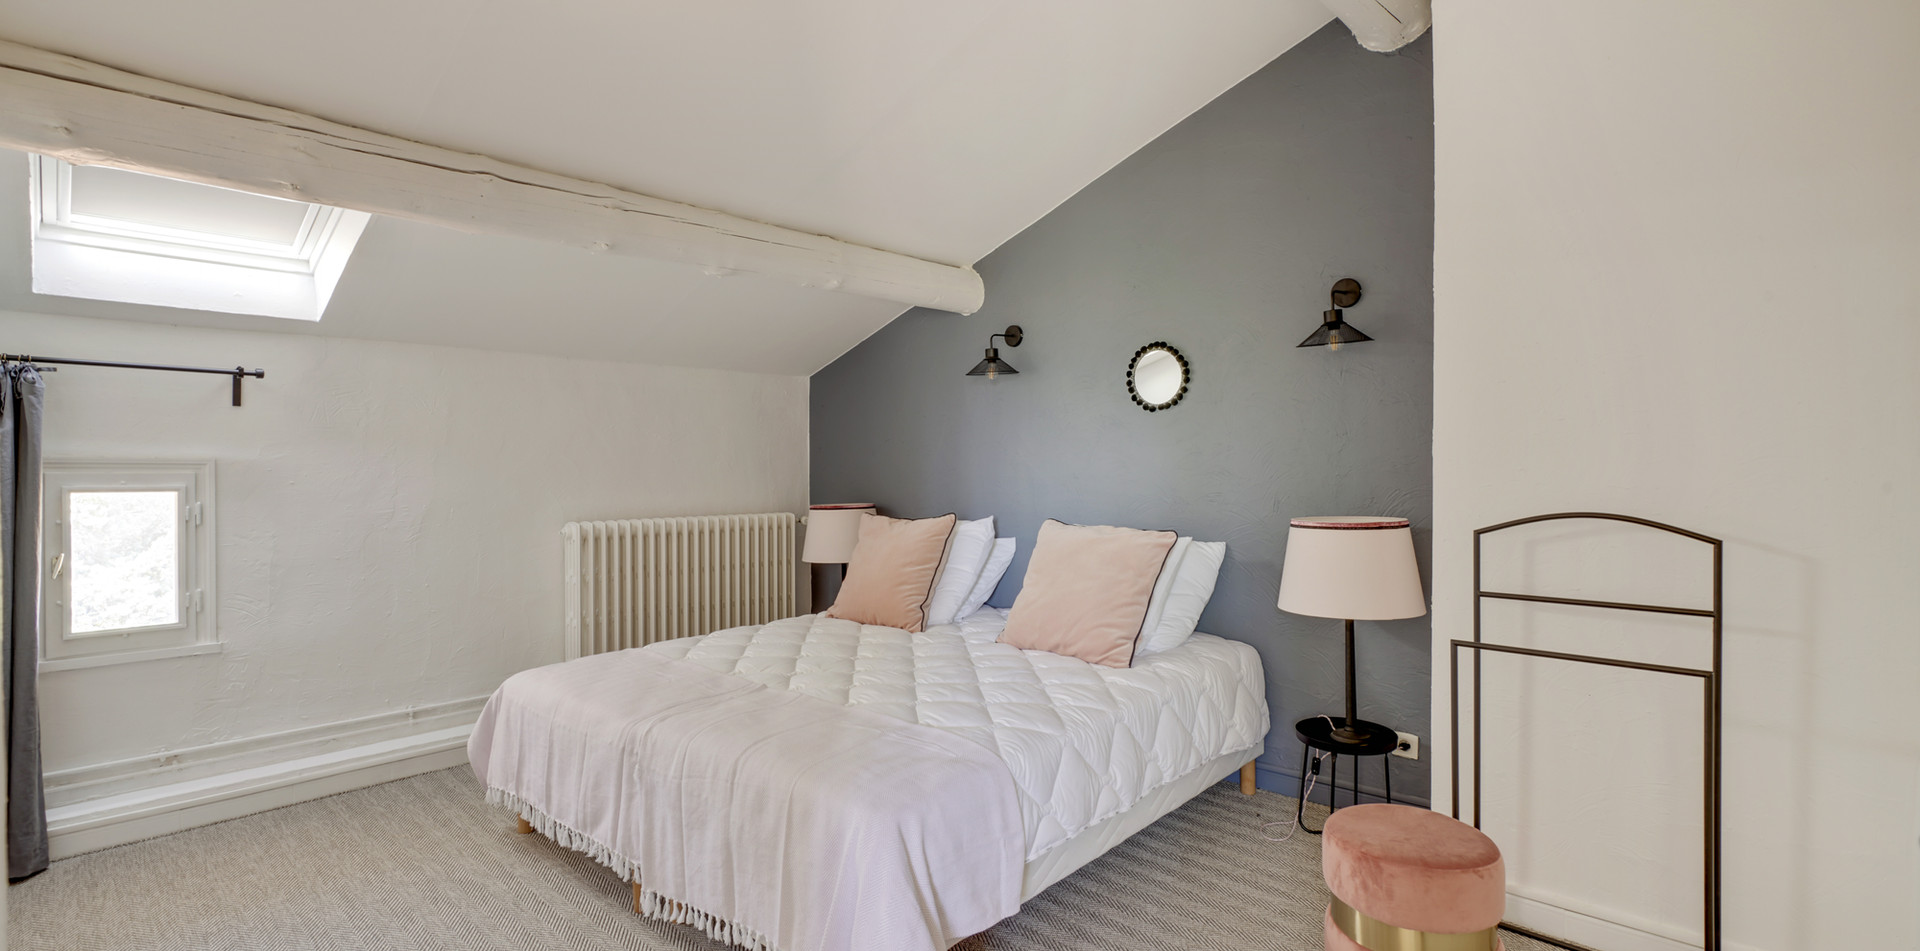 House of happiness, bedroom 1, Mas Saint-Gens